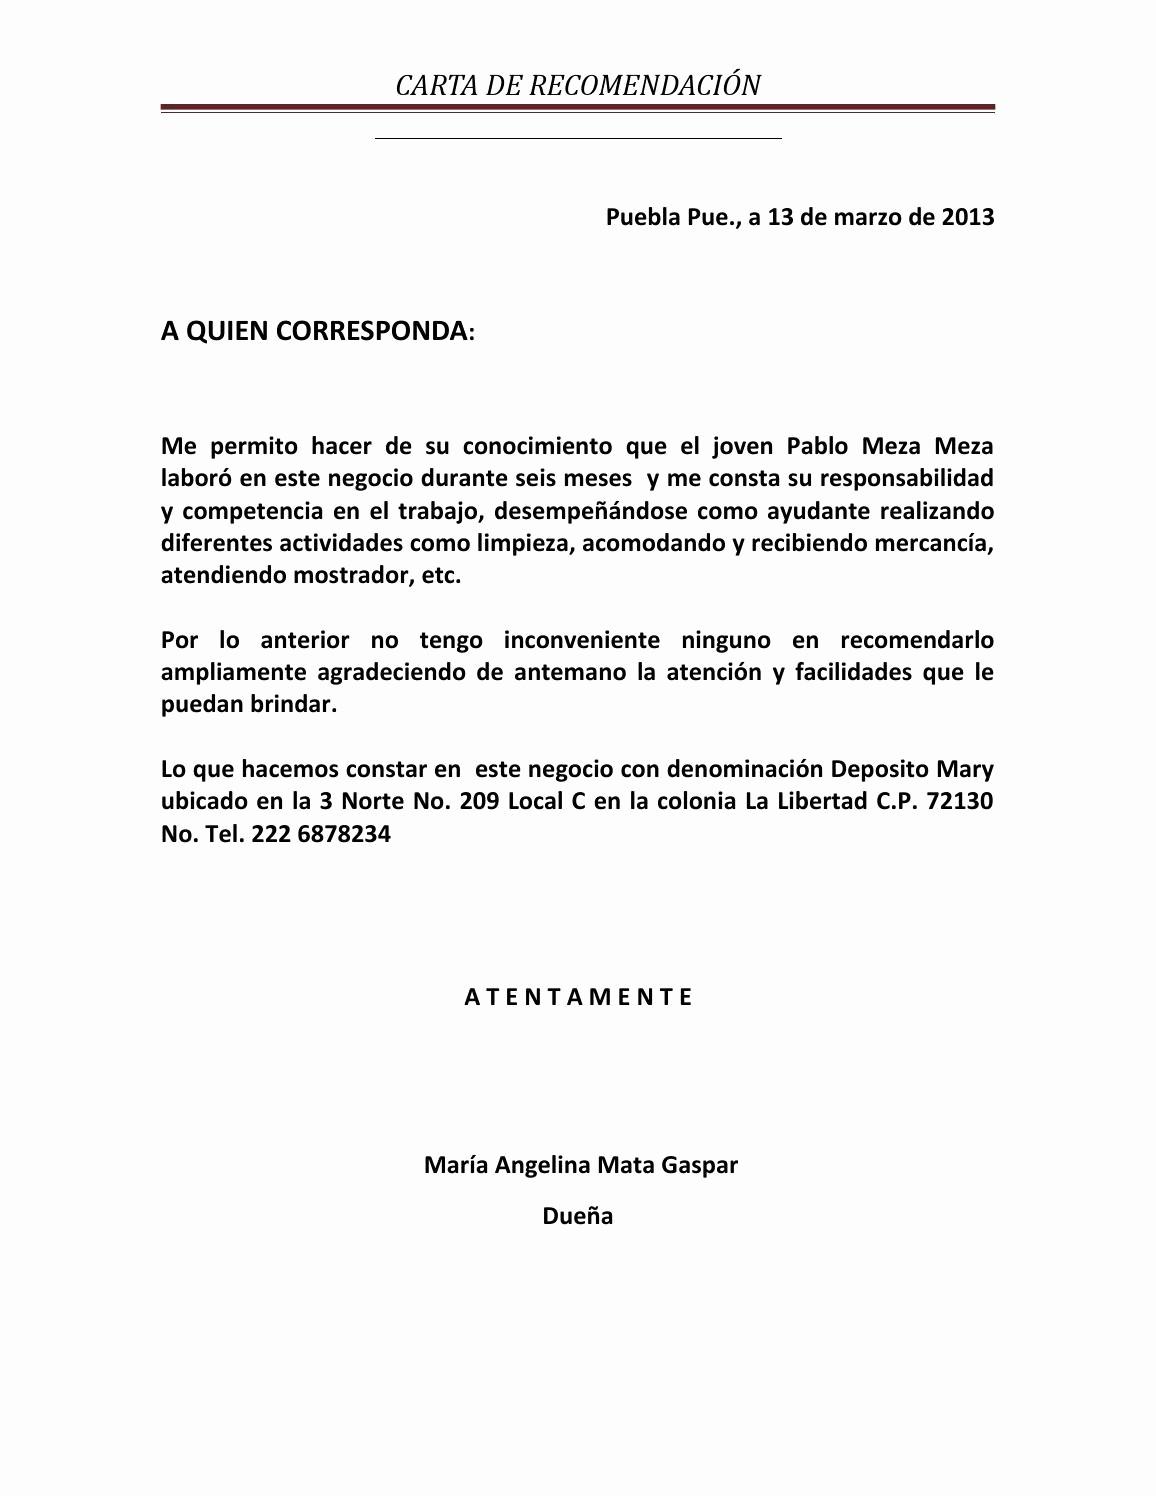 Modelo Carta De Recomendacion Personal Unique Carta Re Endacion Pablom by Hilario issuu